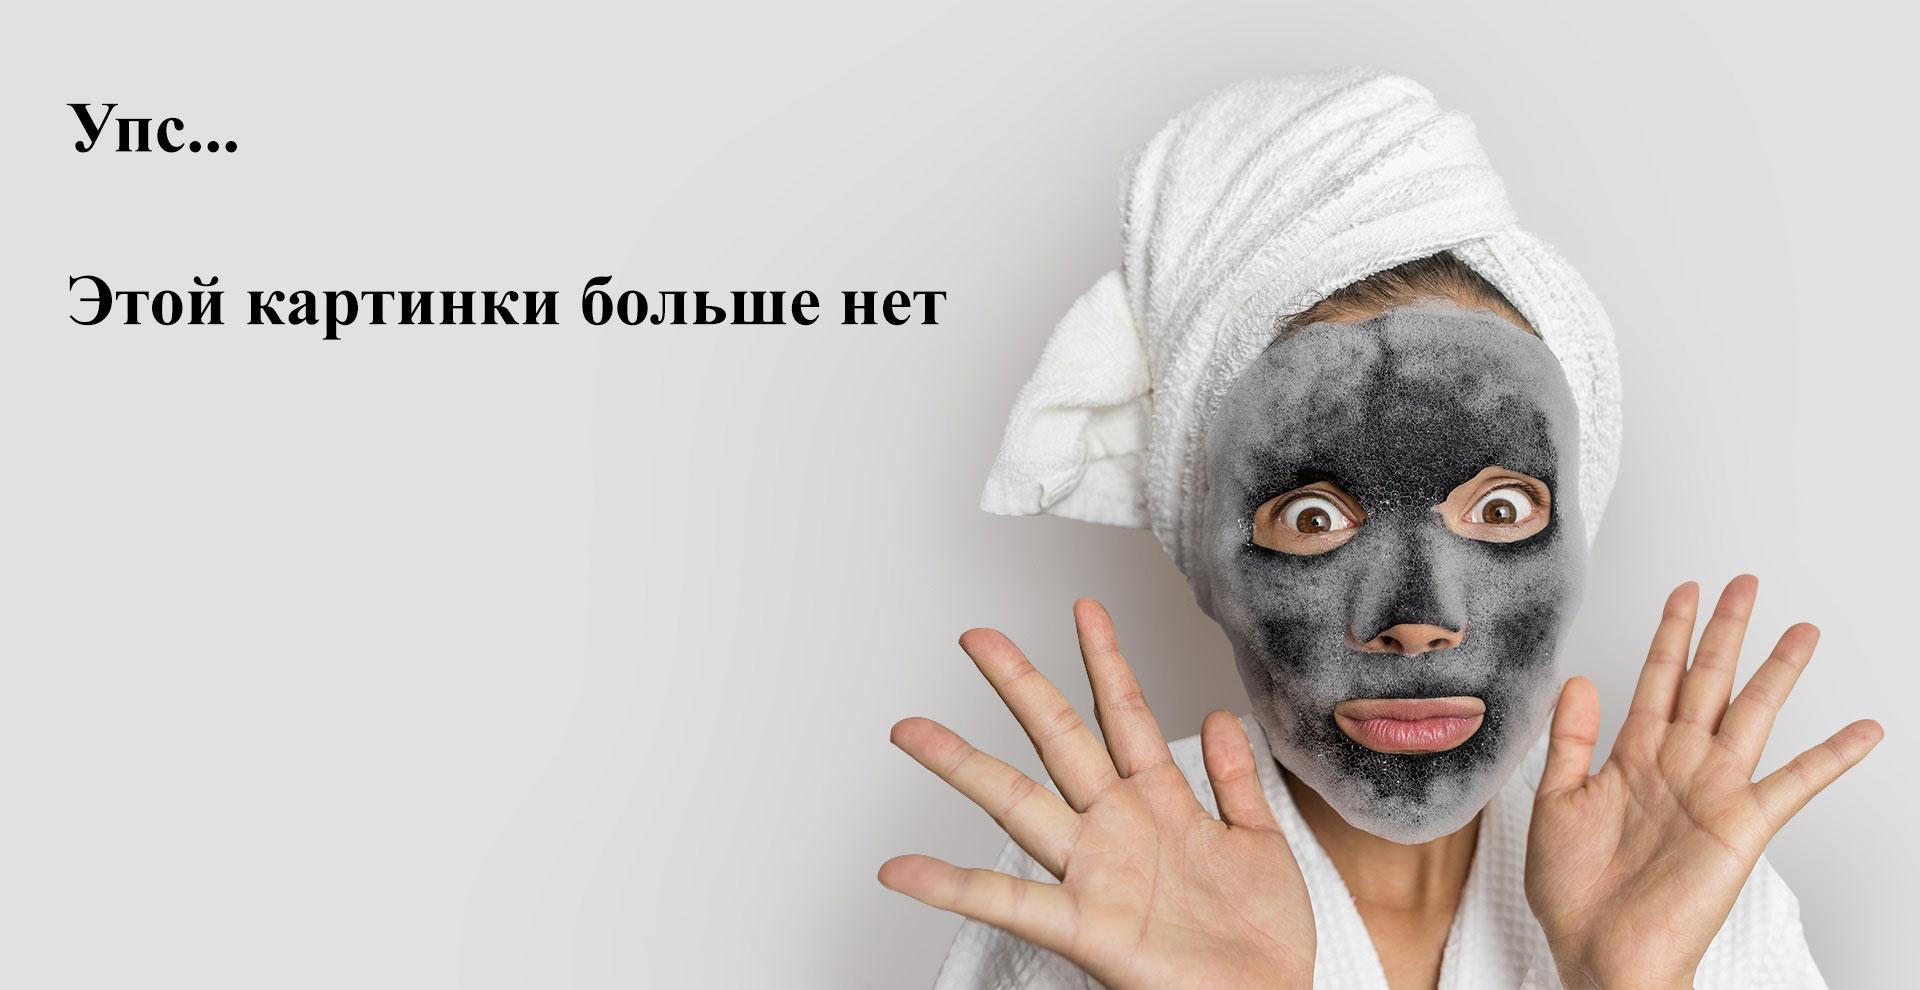 Patrisa Nail, Фольга «Битое стекло» №10, розовый перламутр